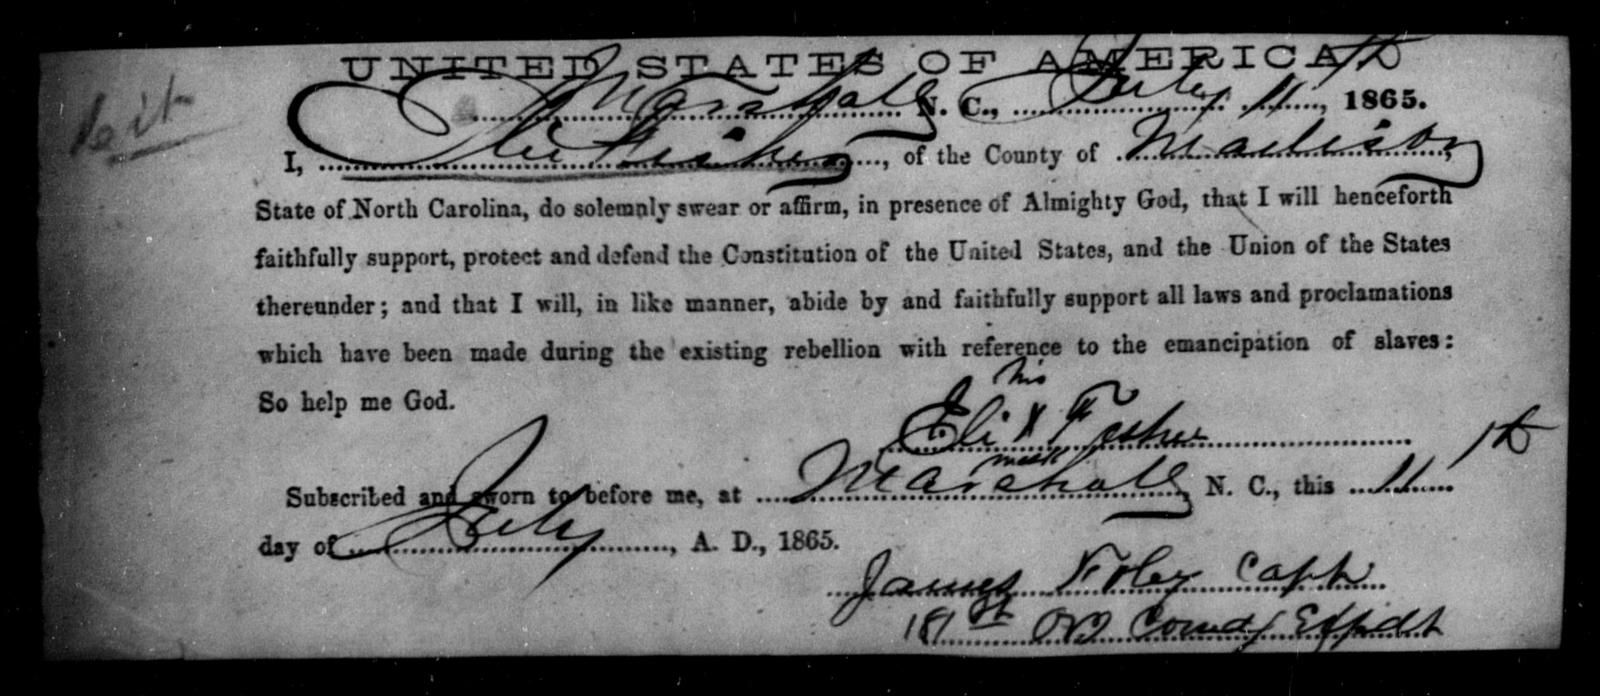 Fisher, Eli - State: North Carolina - Year: 1865